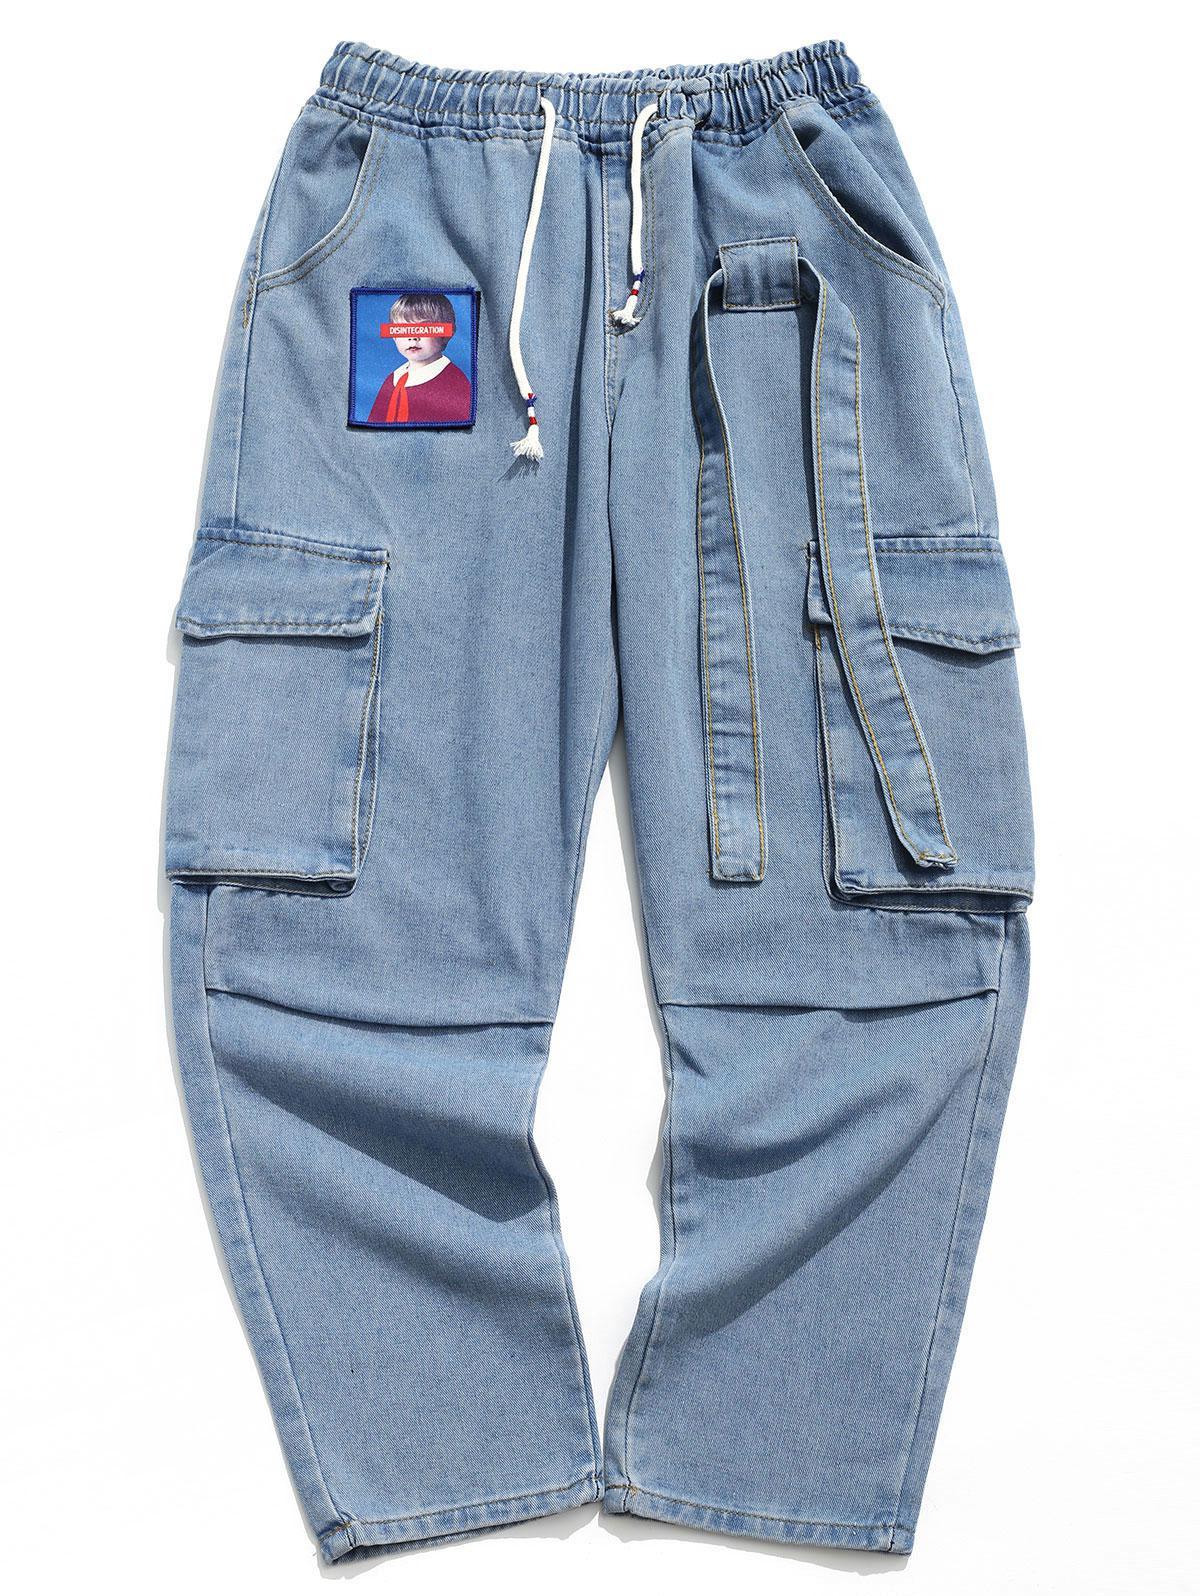 Portrait Sticker Side Flap Pocket Solid Color Casual Jeans фото